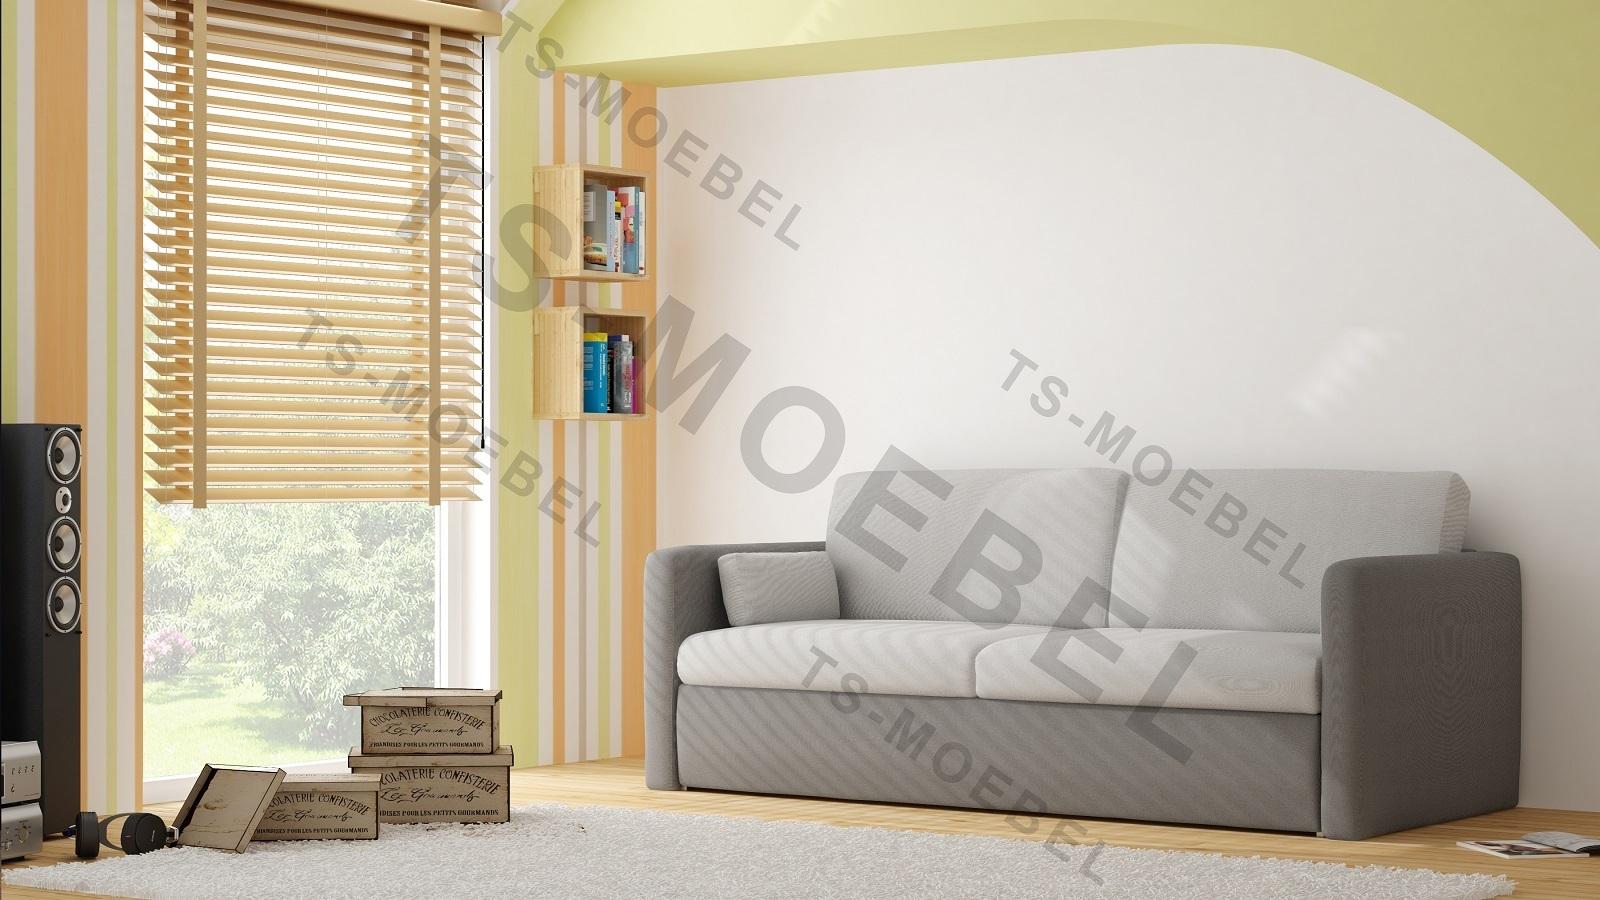 matratzen ts mbel wall bed duo sofa mit etagenbett inkl - Etagenbettcouch